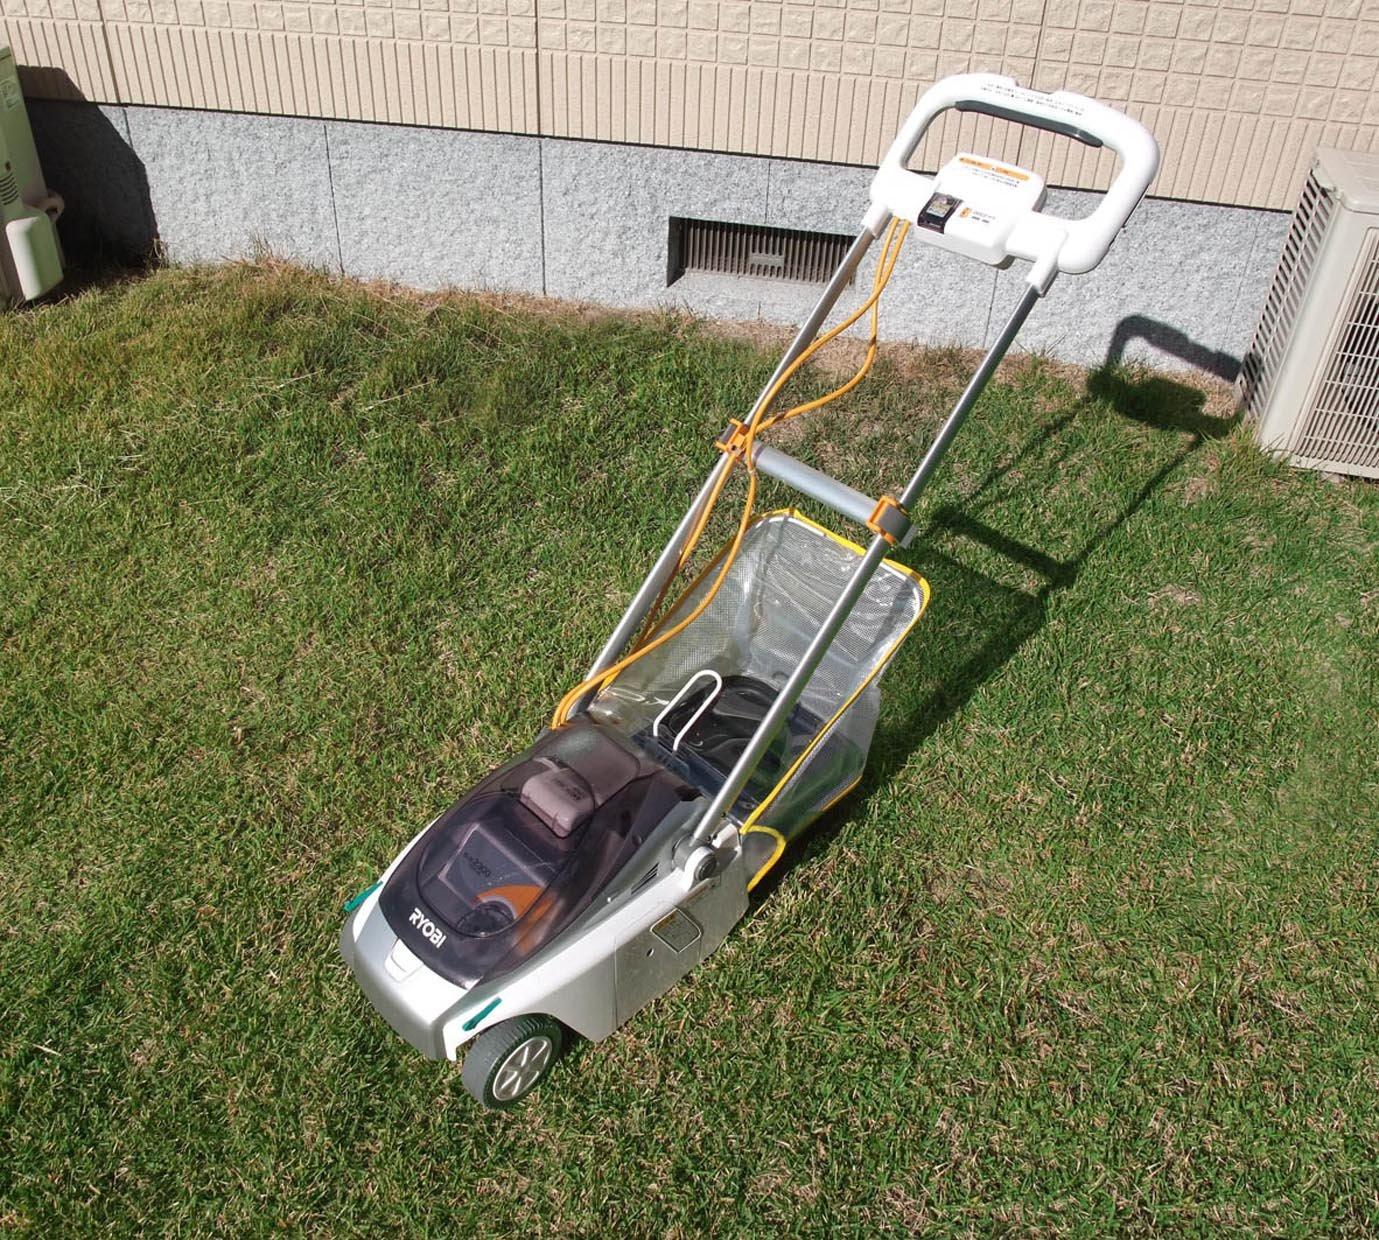 リョービ(RYOBI) 充電式芝刈機 BLM-2300